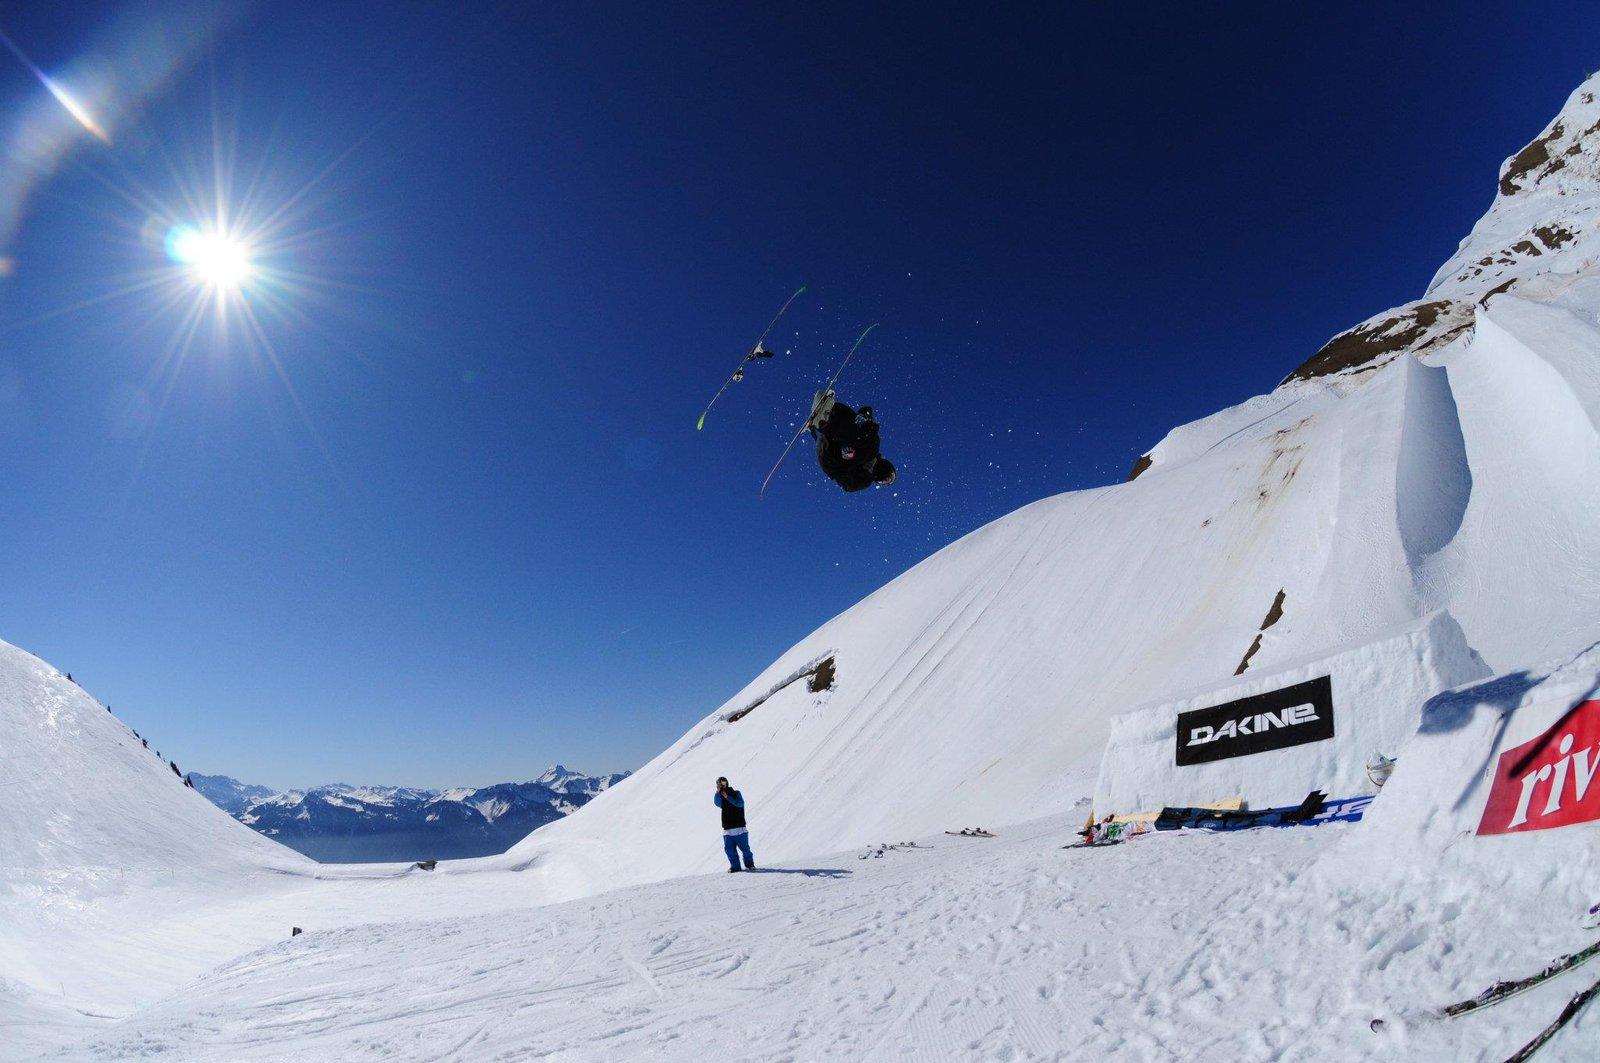 Lost ski in dub cork